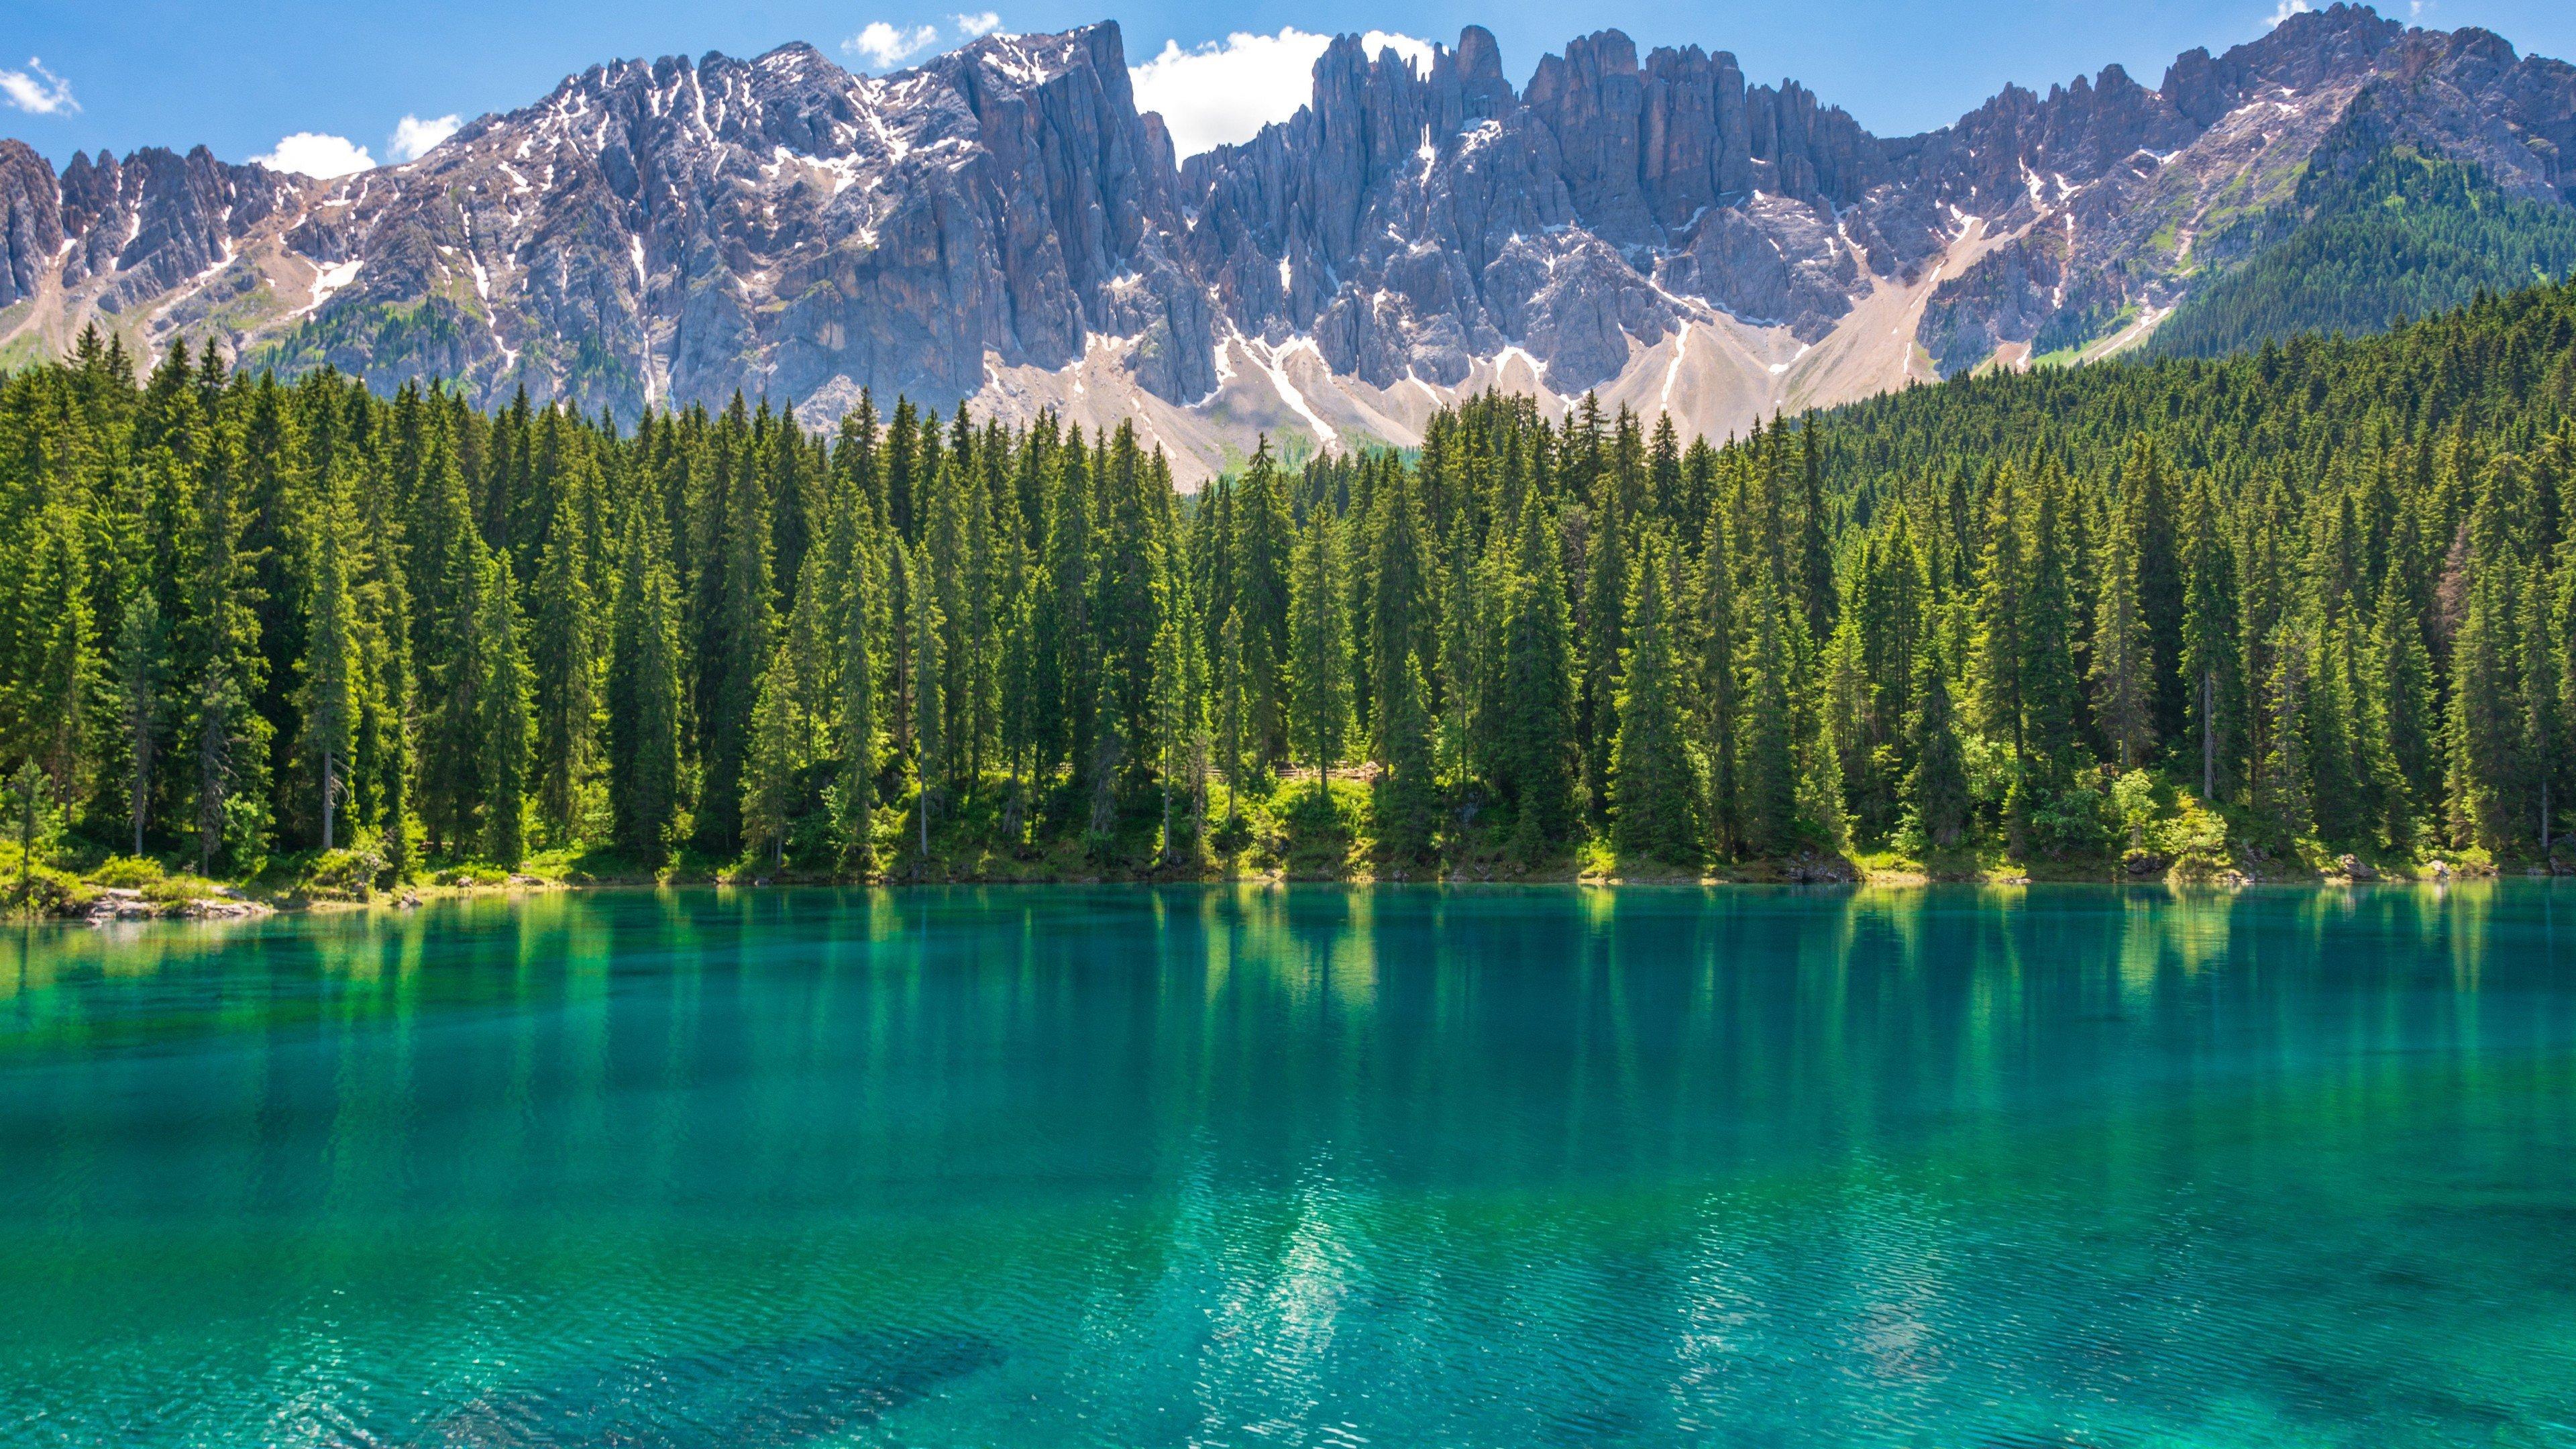 Fondos de pantalla Bosque con lago azulado y montañas